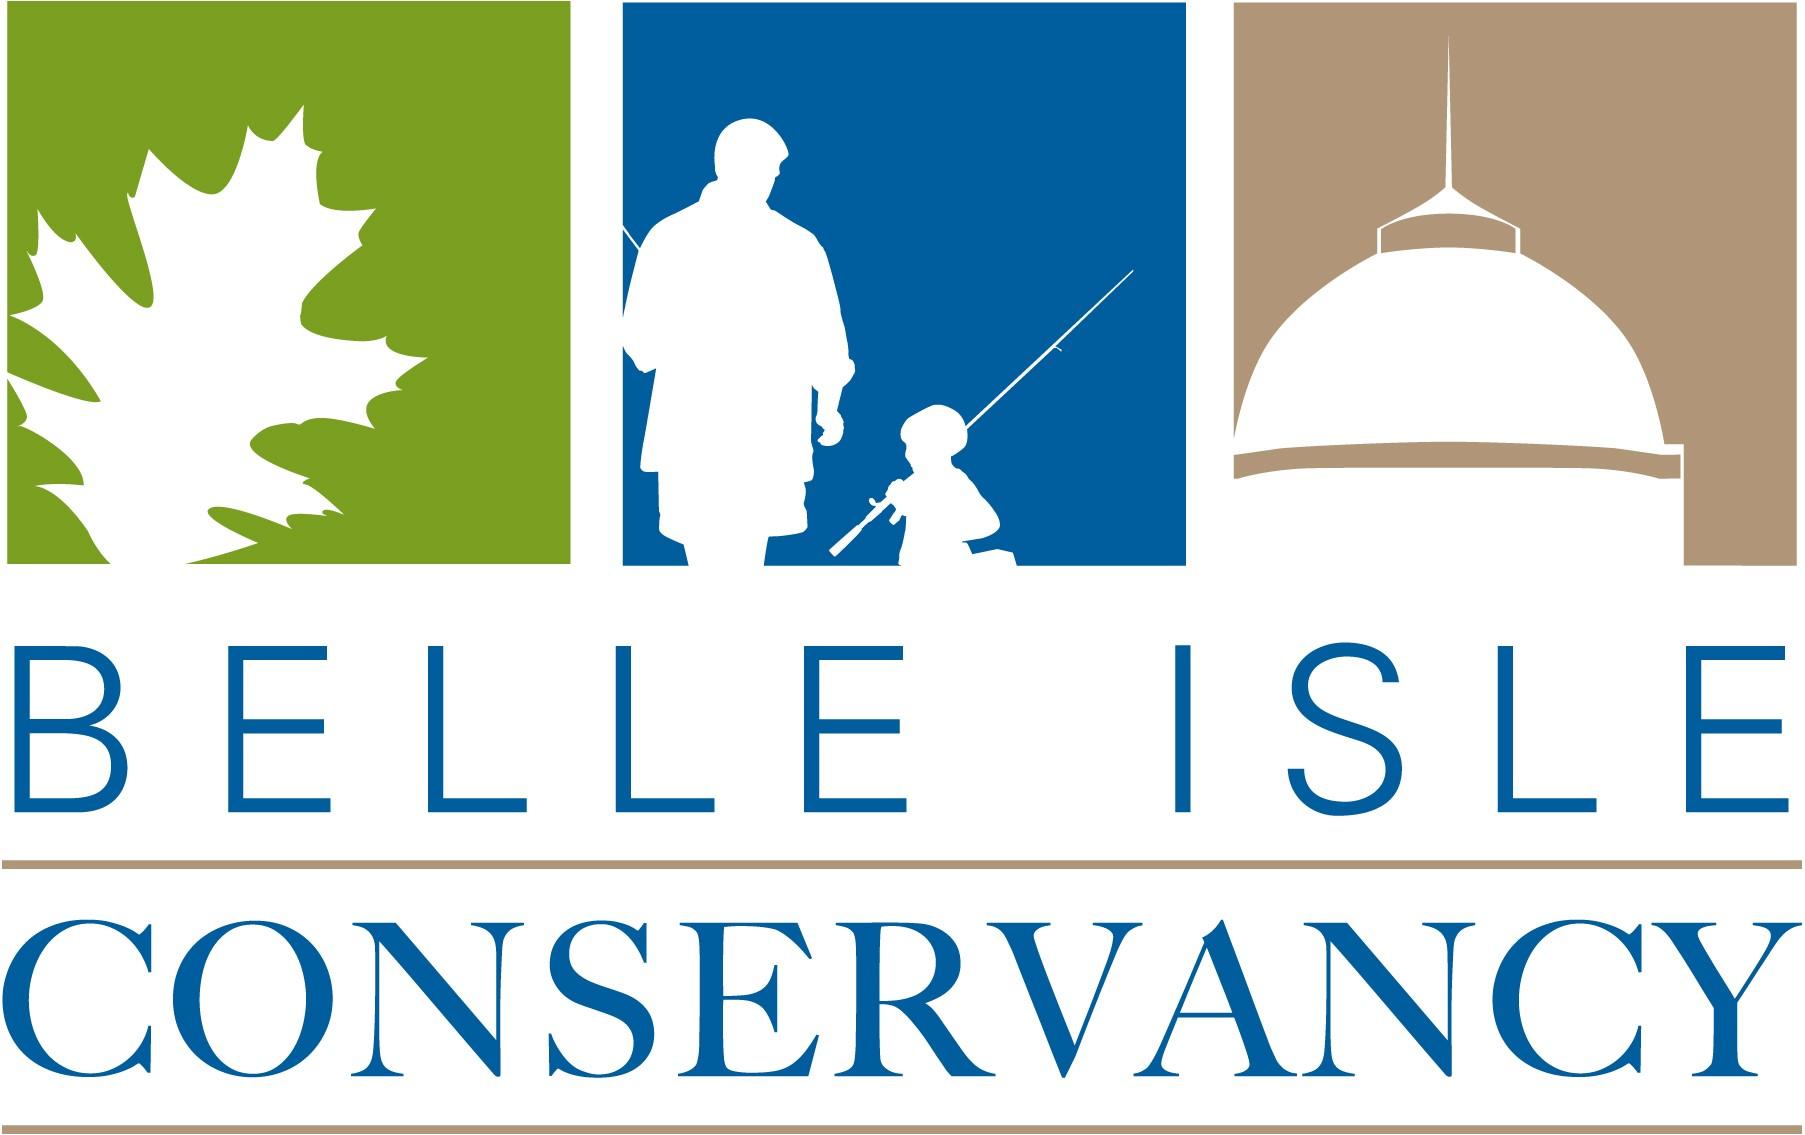 Belle_Isle_Conservancy_logo.jpg